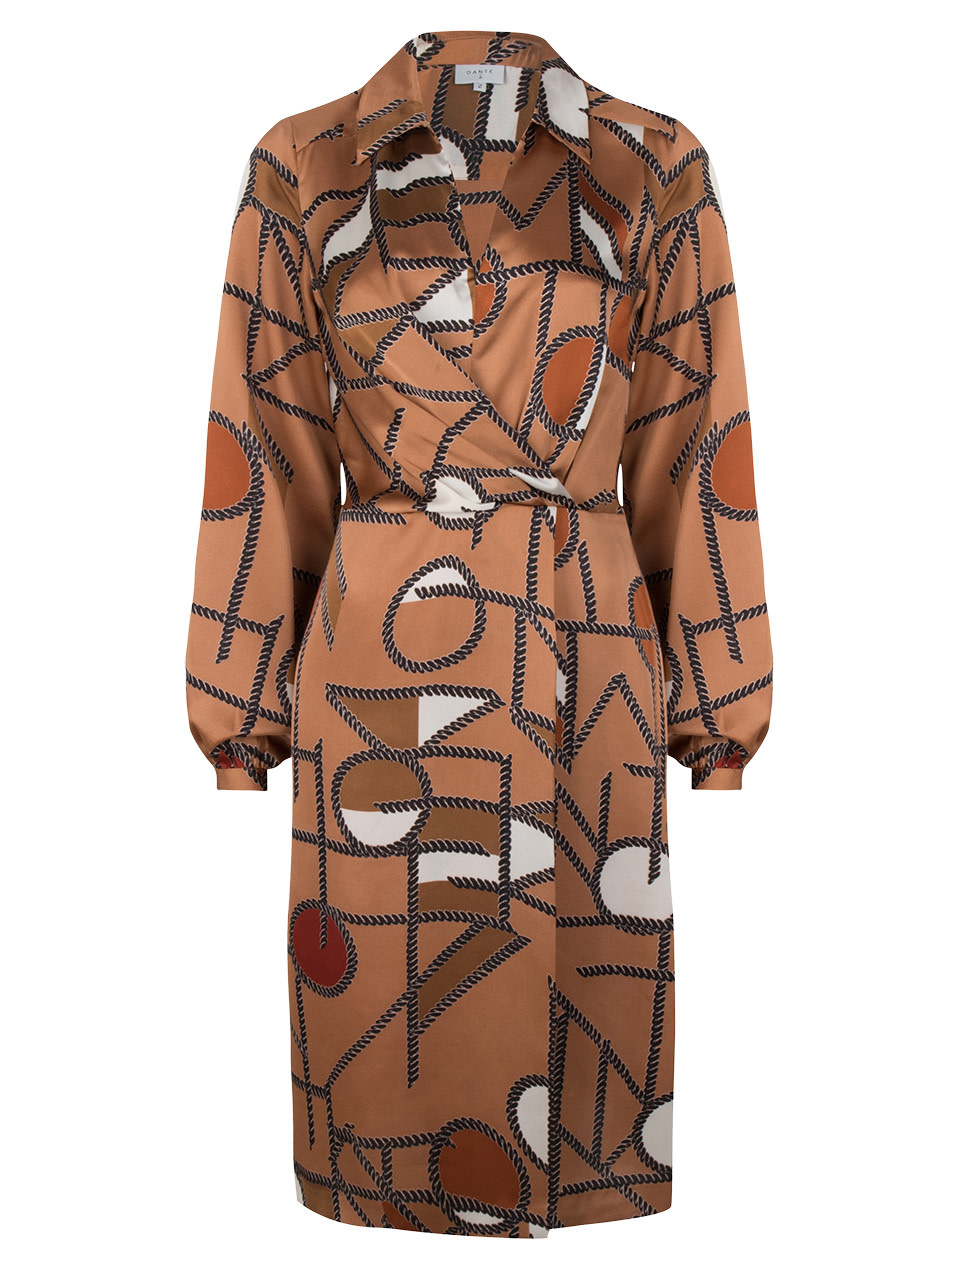 Madison chain print dress long-1